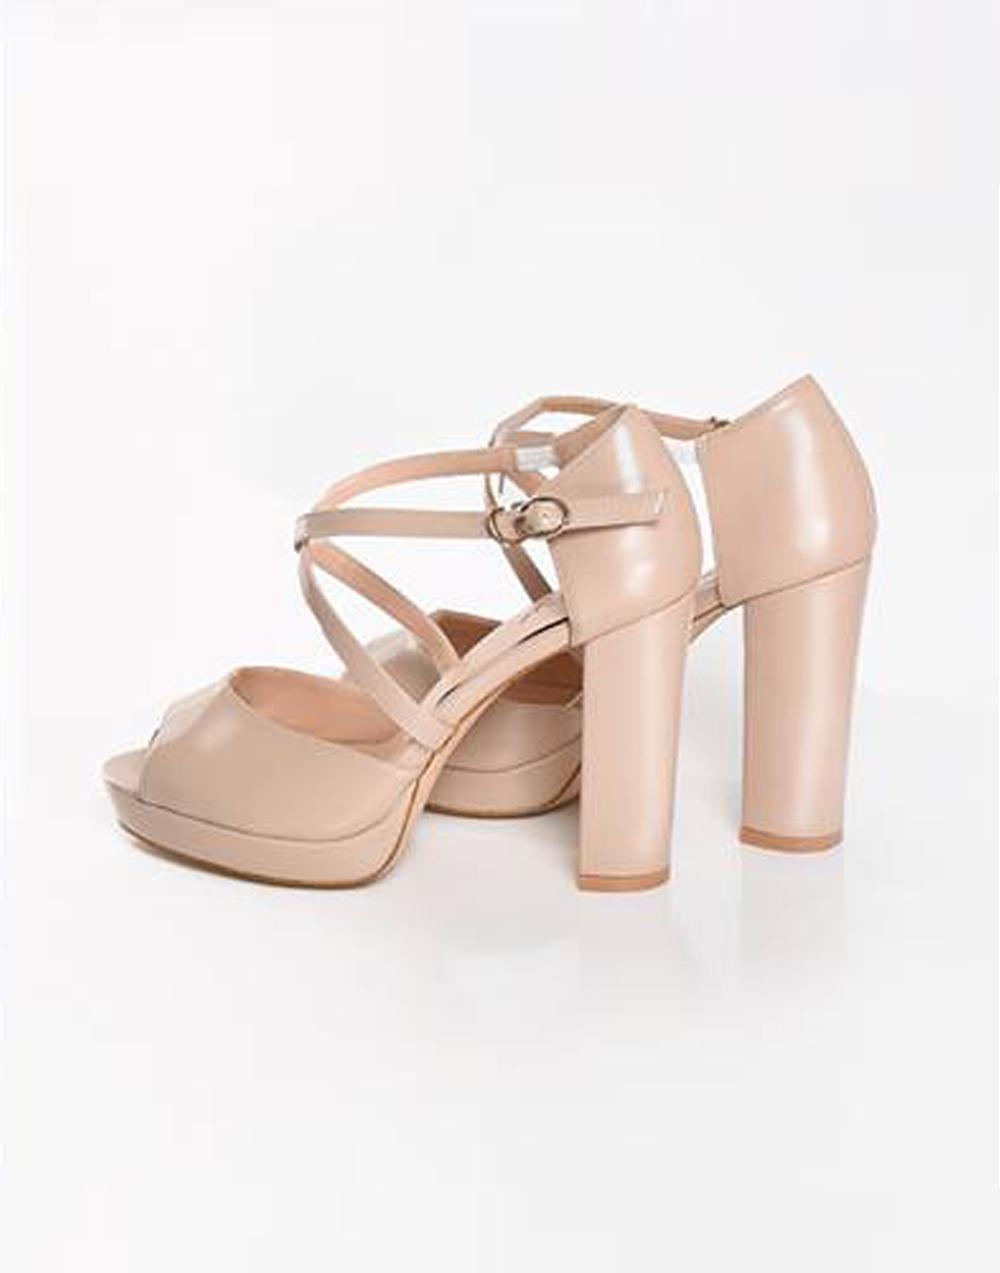 """ Ariel "" Peep-toe platform Heels With Cross Straps"